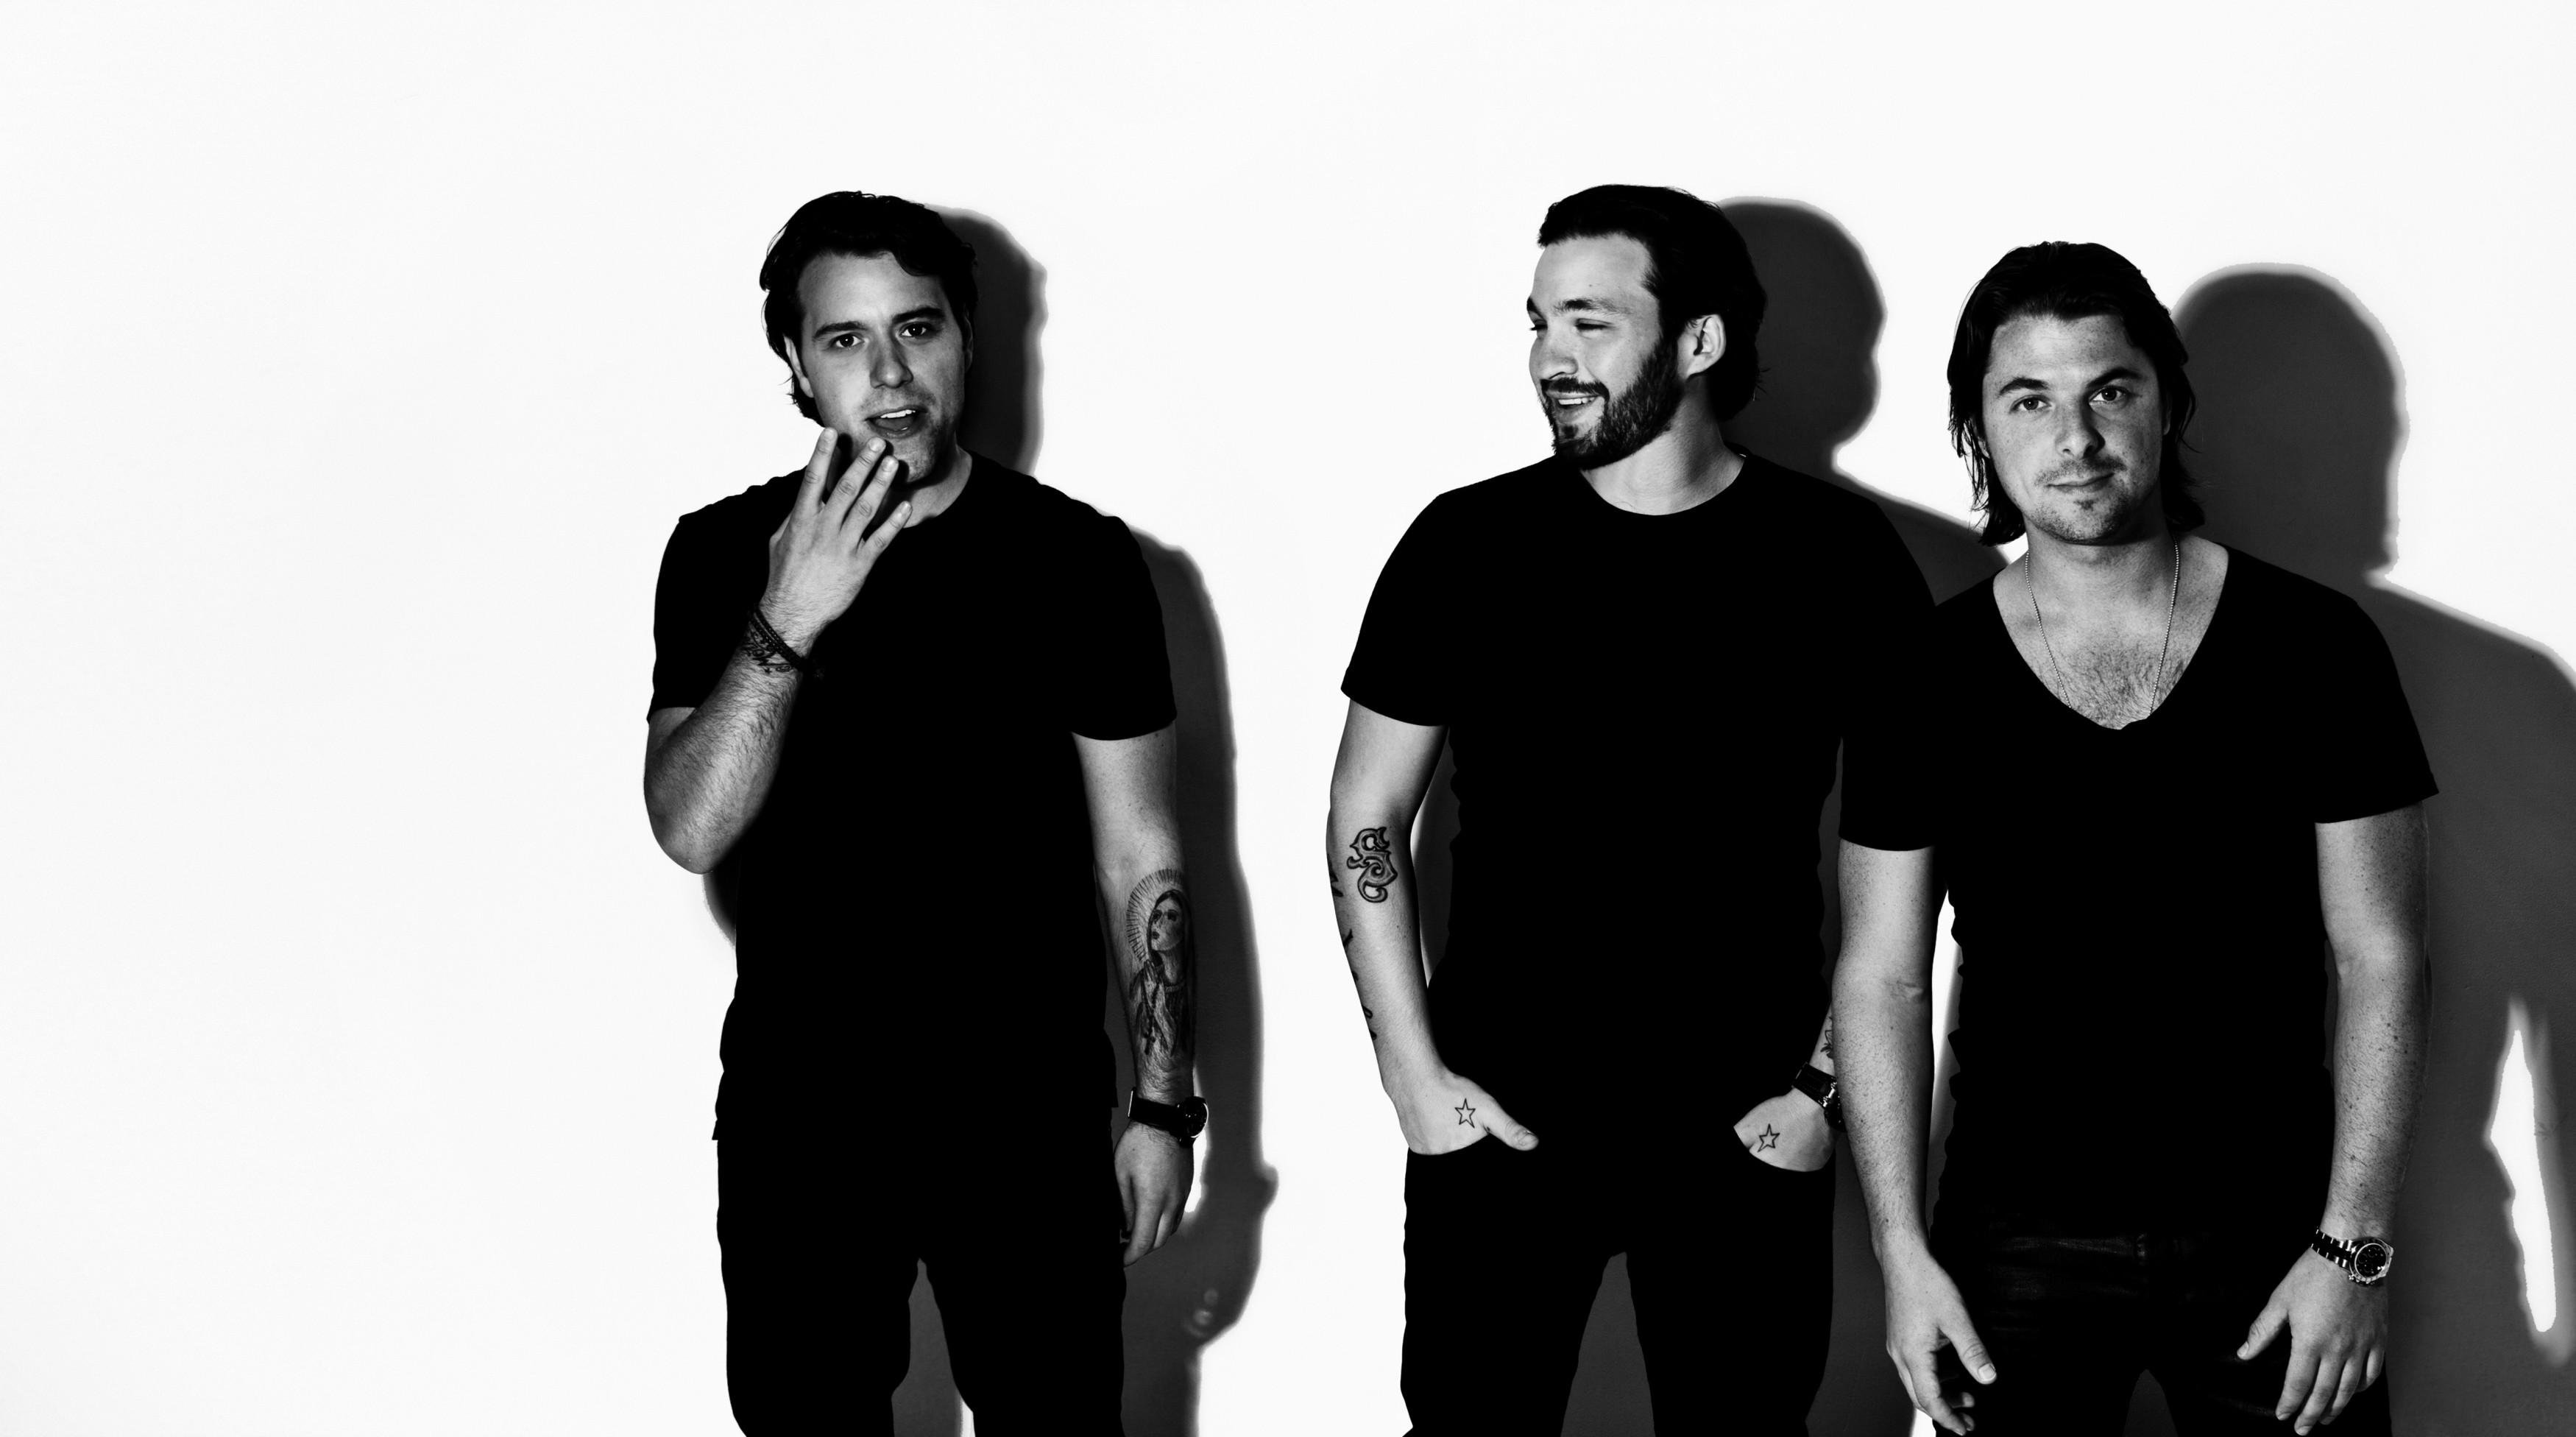 Swedish House Mafia Wallpaper HD